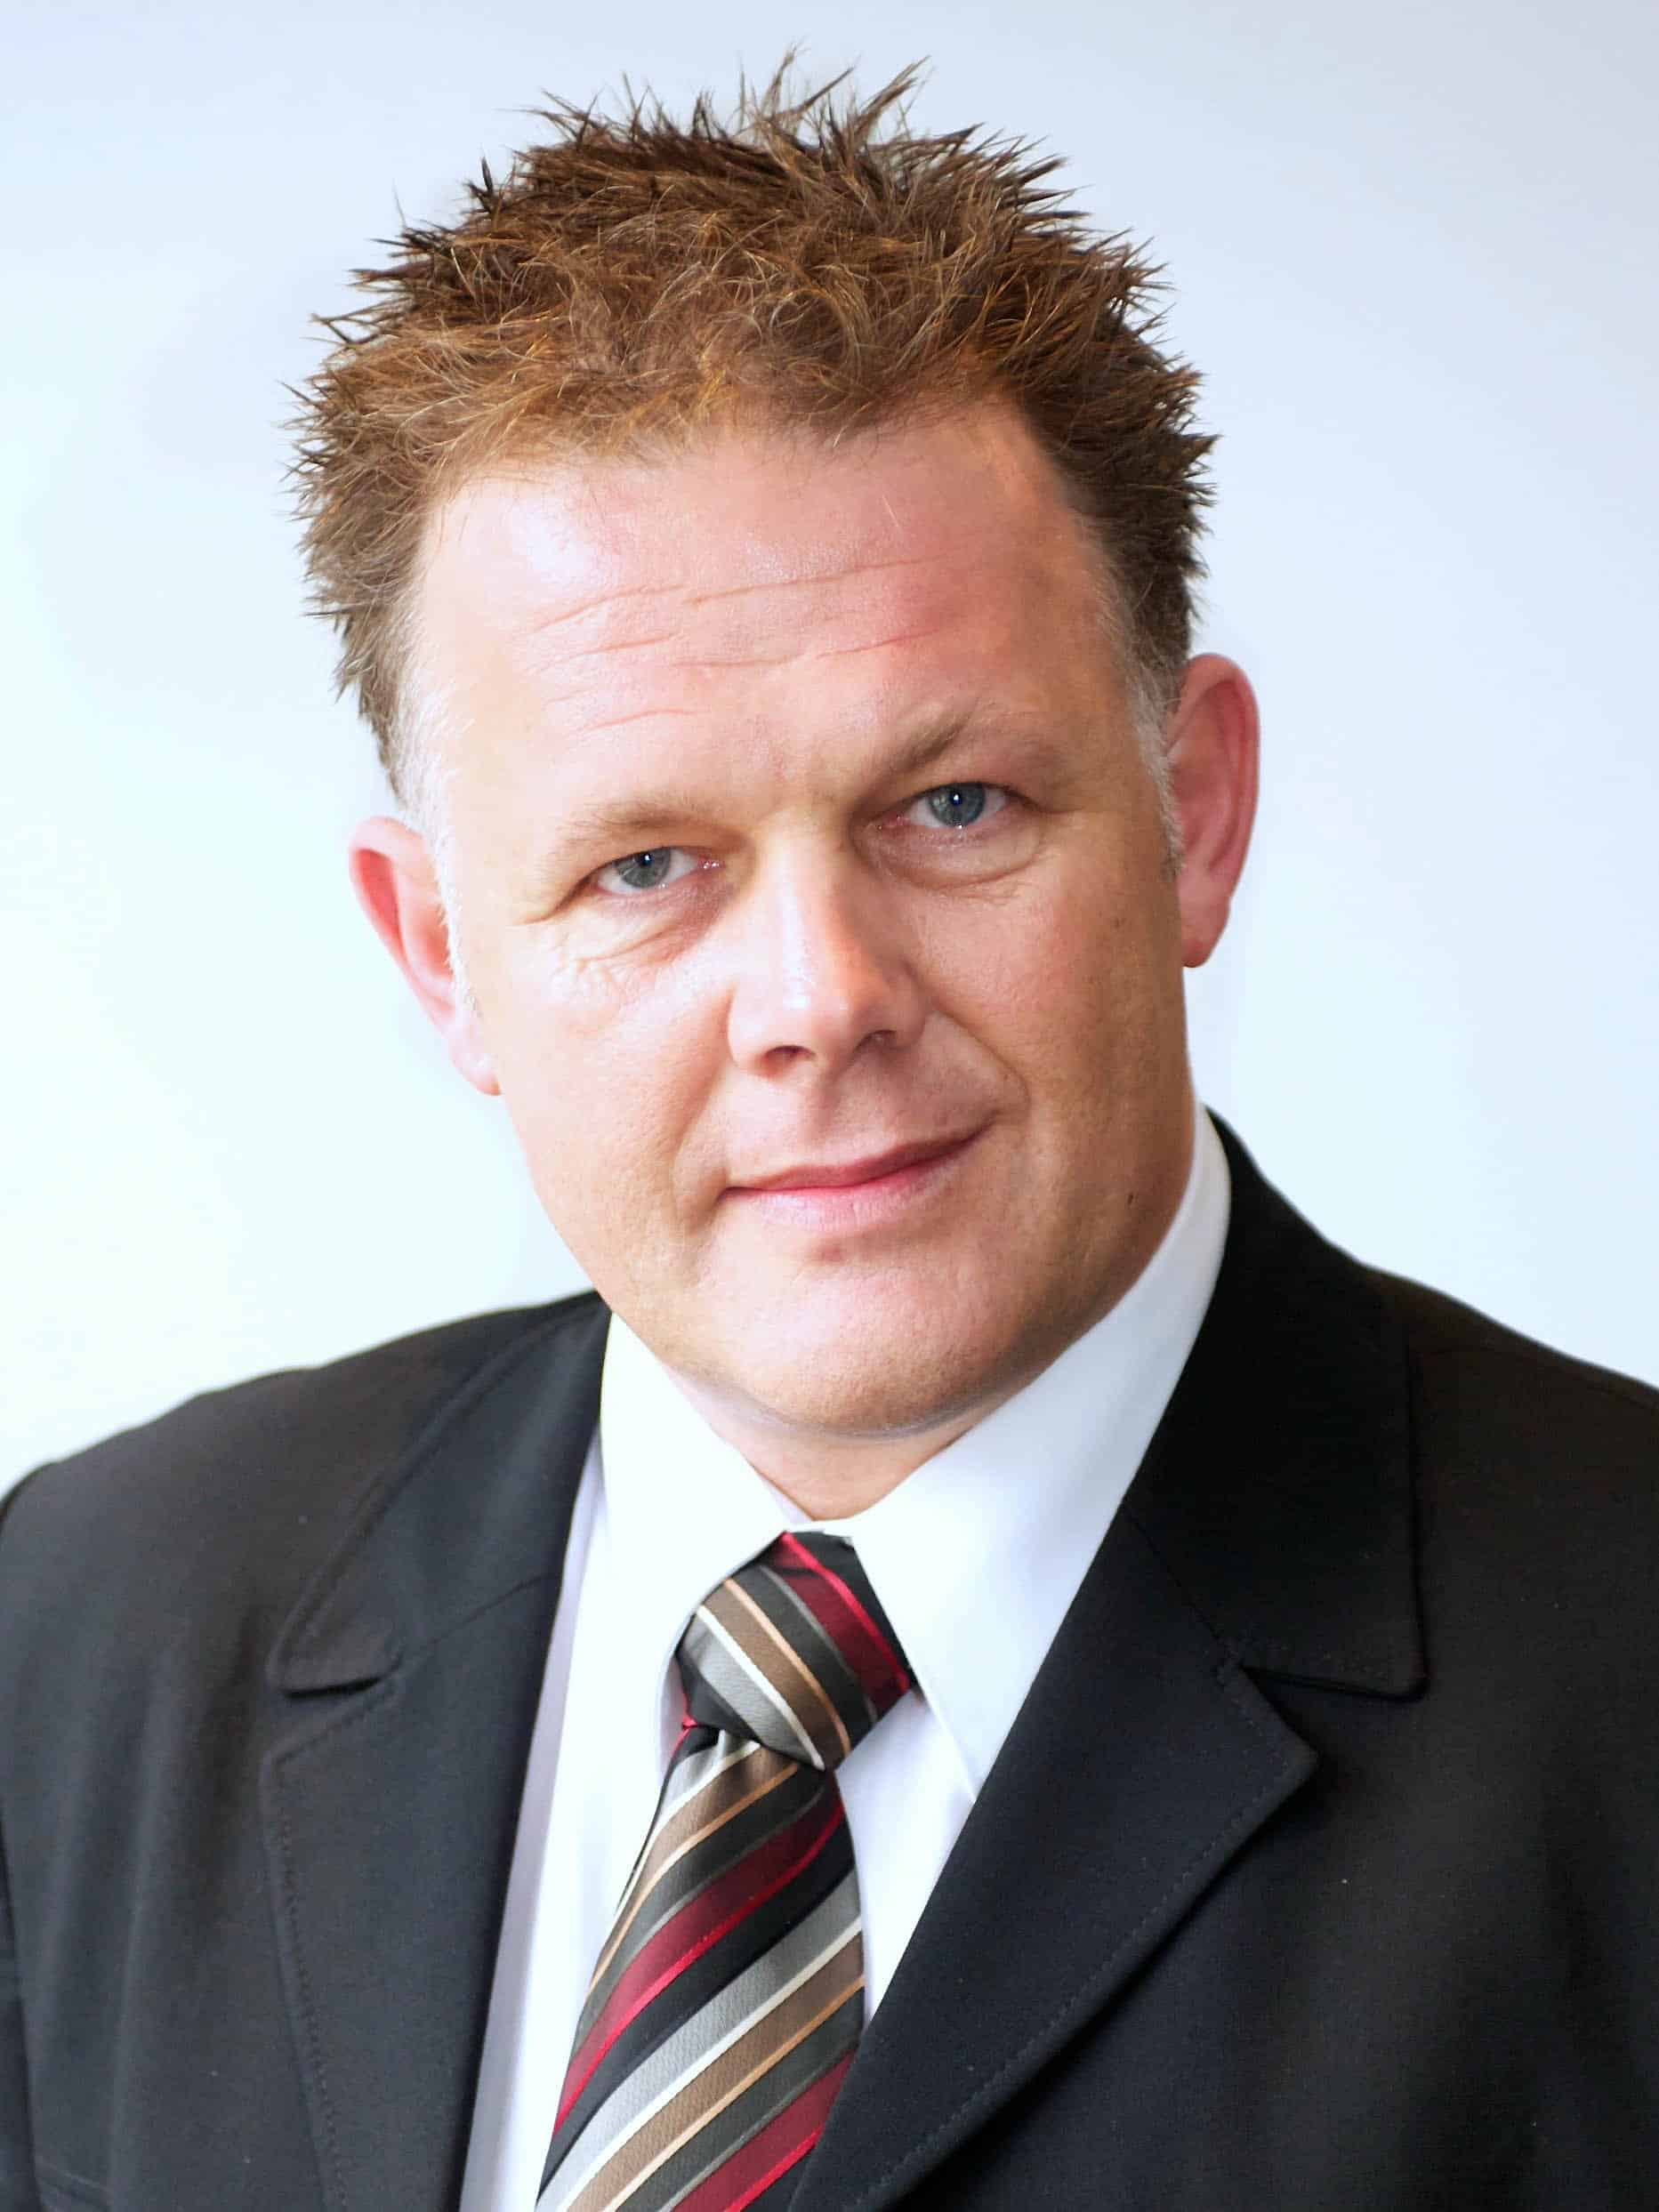 Patrick Bolger